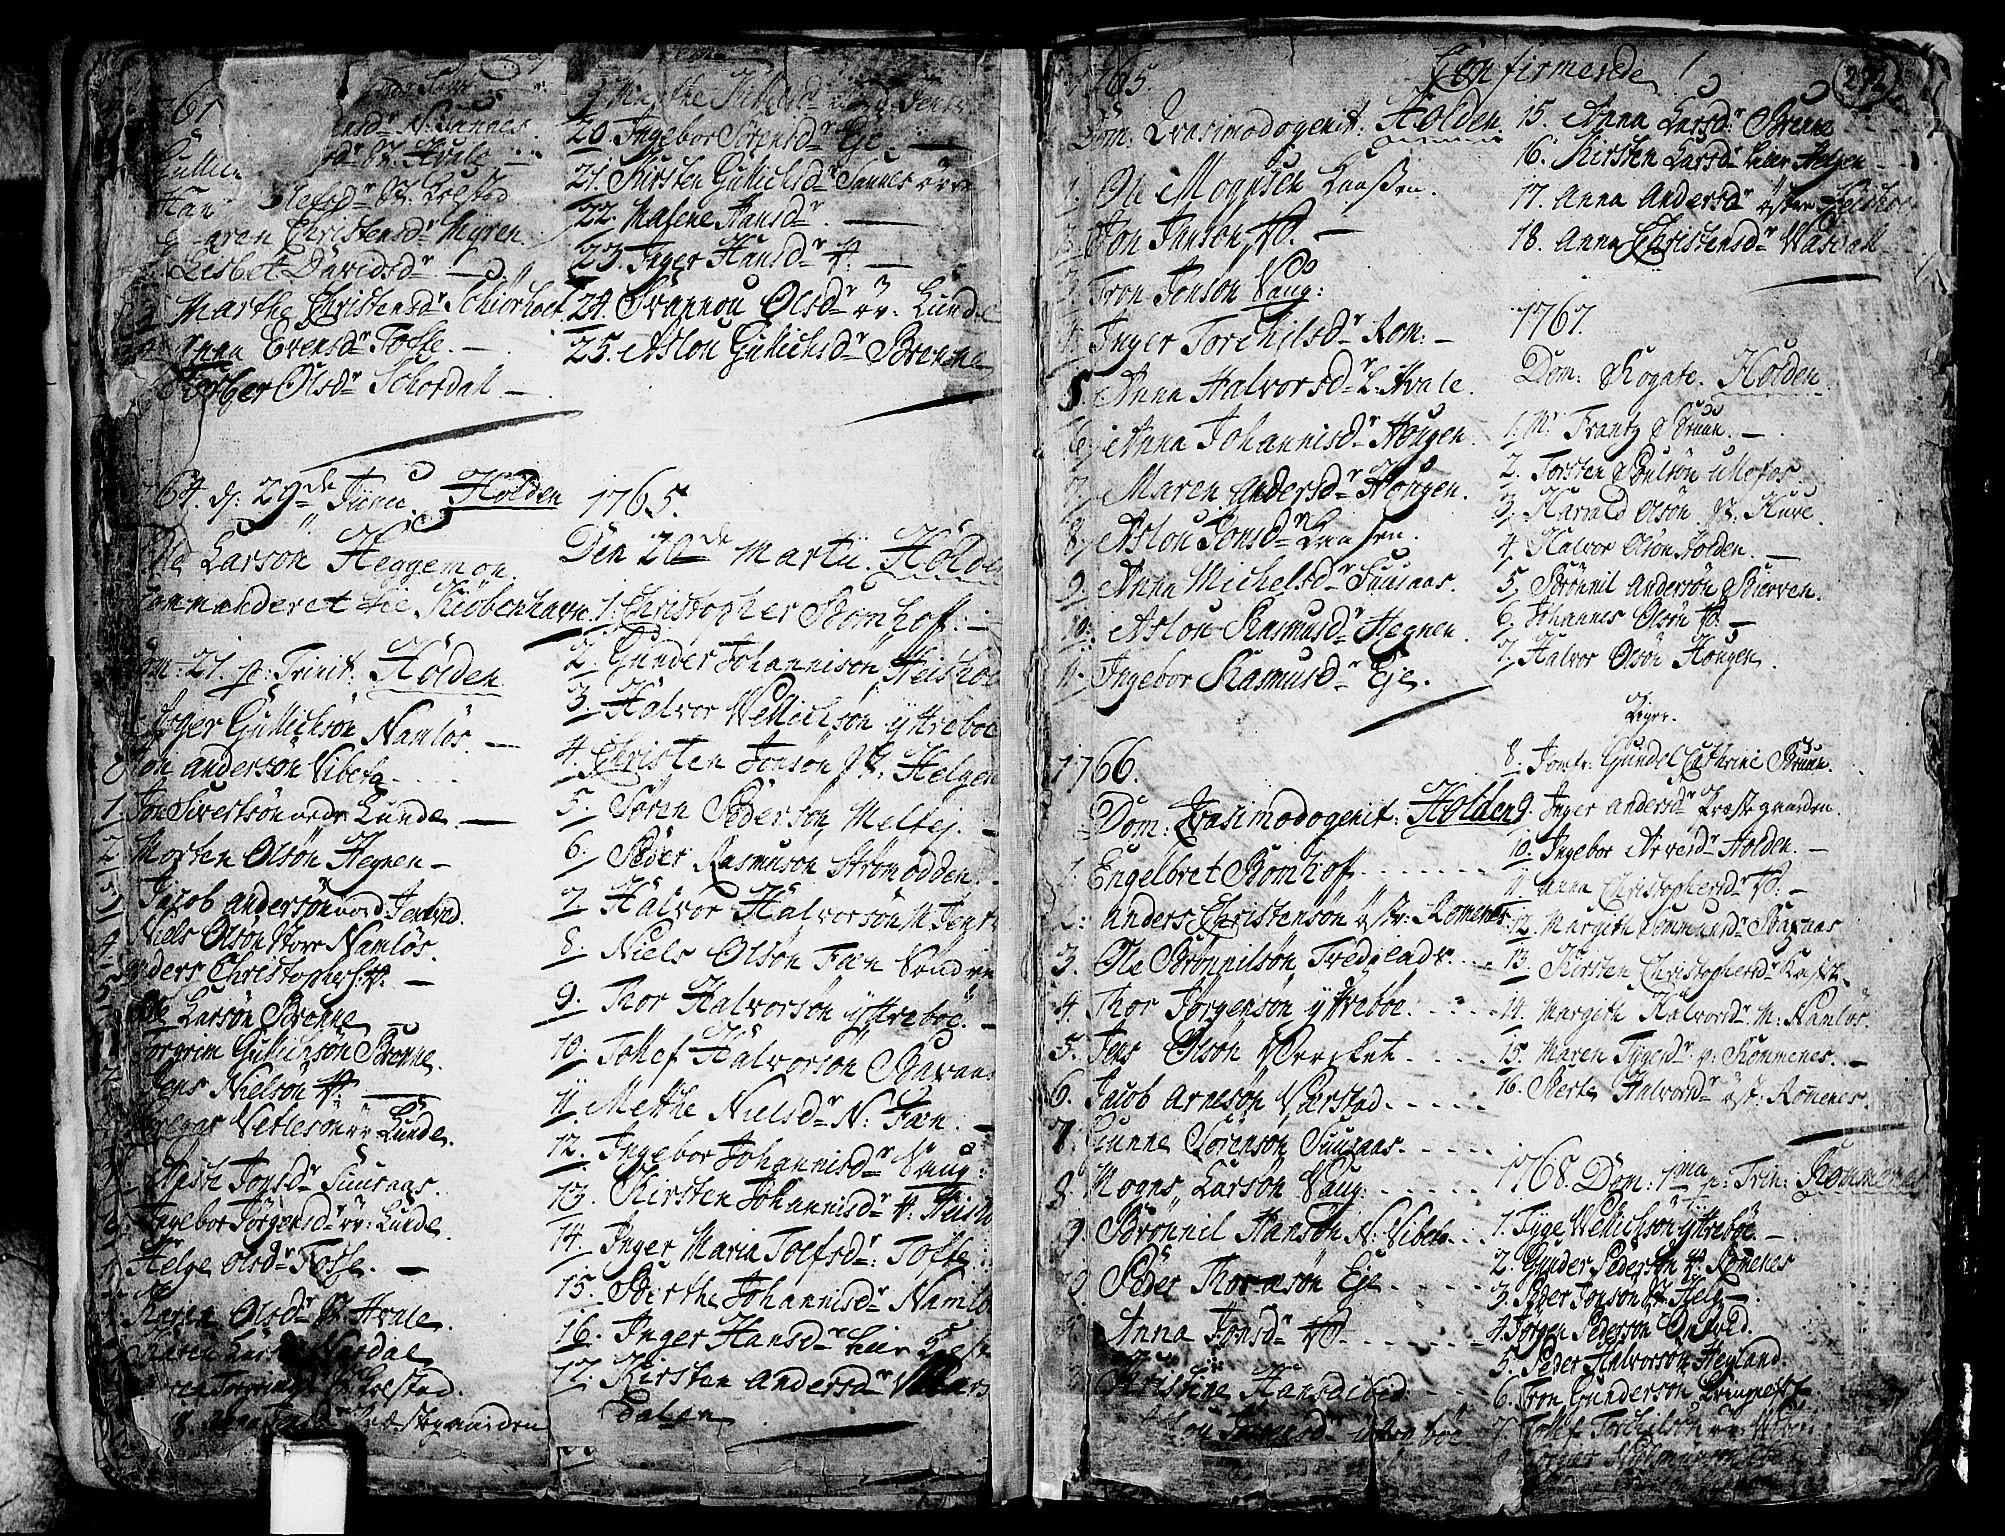 SAKO, Holla kirkebøker, F/Fa/L0001: Ministerialbok nr. 1, 1717-1779, s. 272